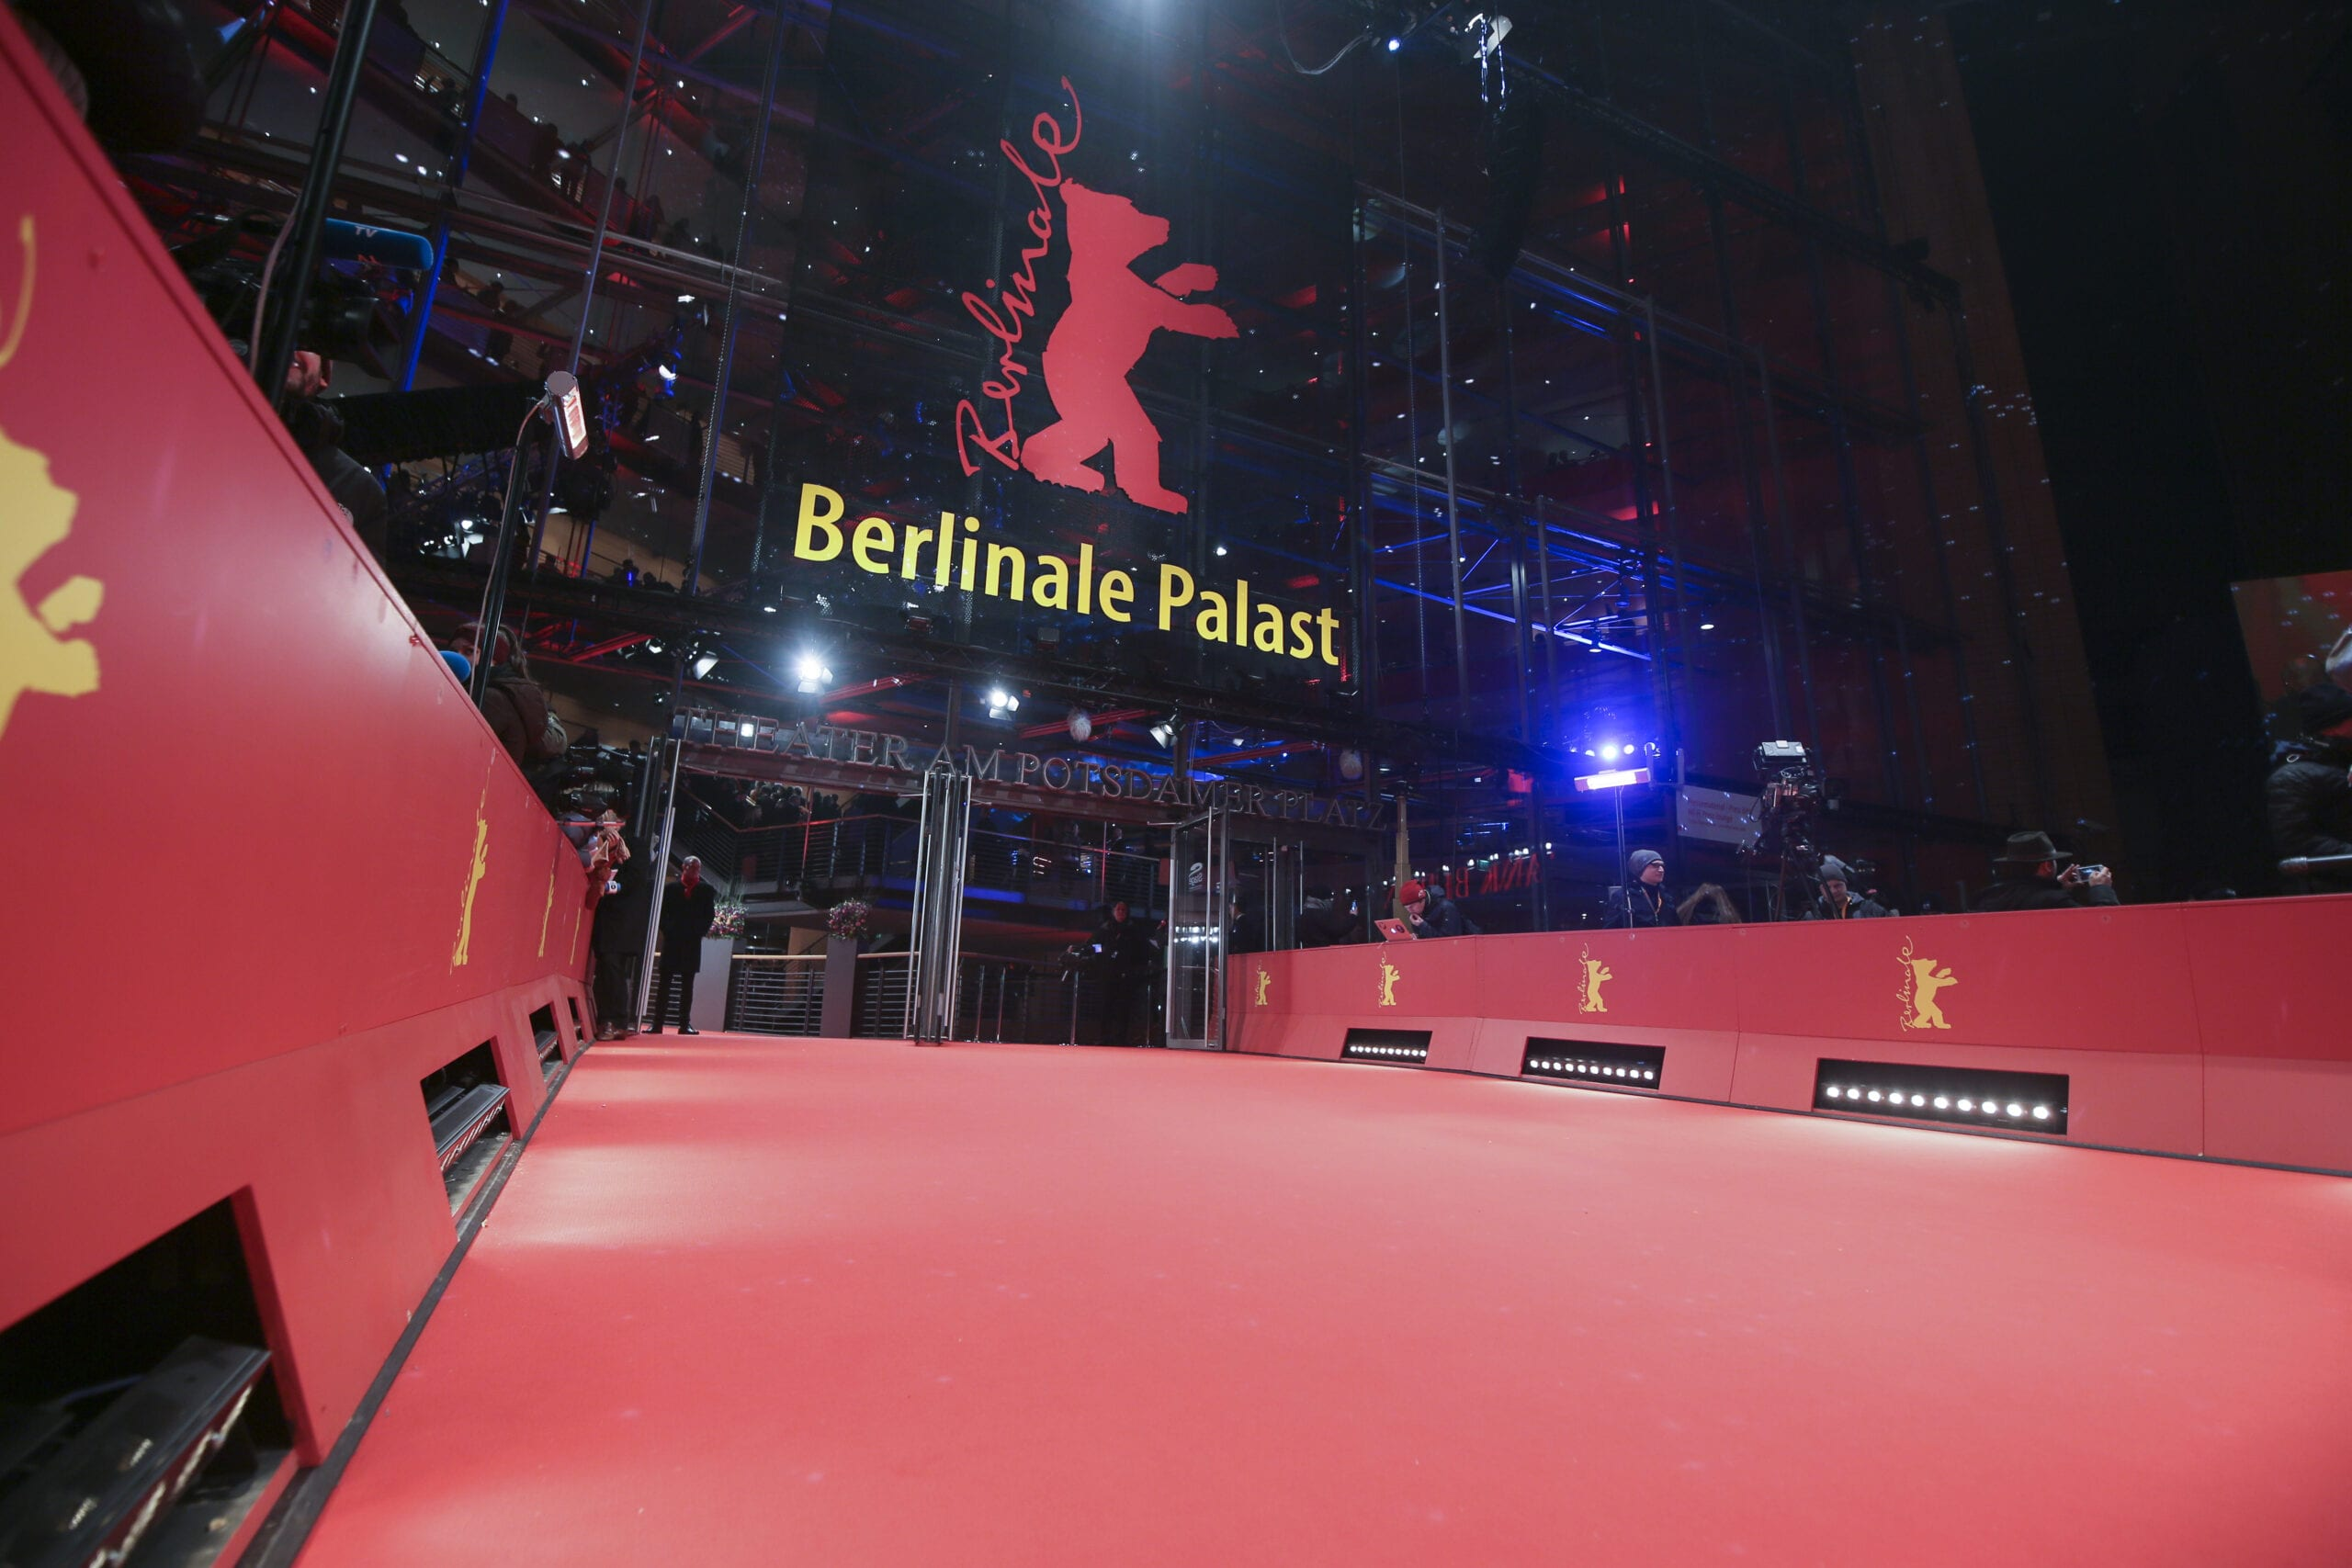 Собираемся на Берлинале 2020: смотрим на Хиллари Клинтон и ждем ренессанса Джонни Деппа